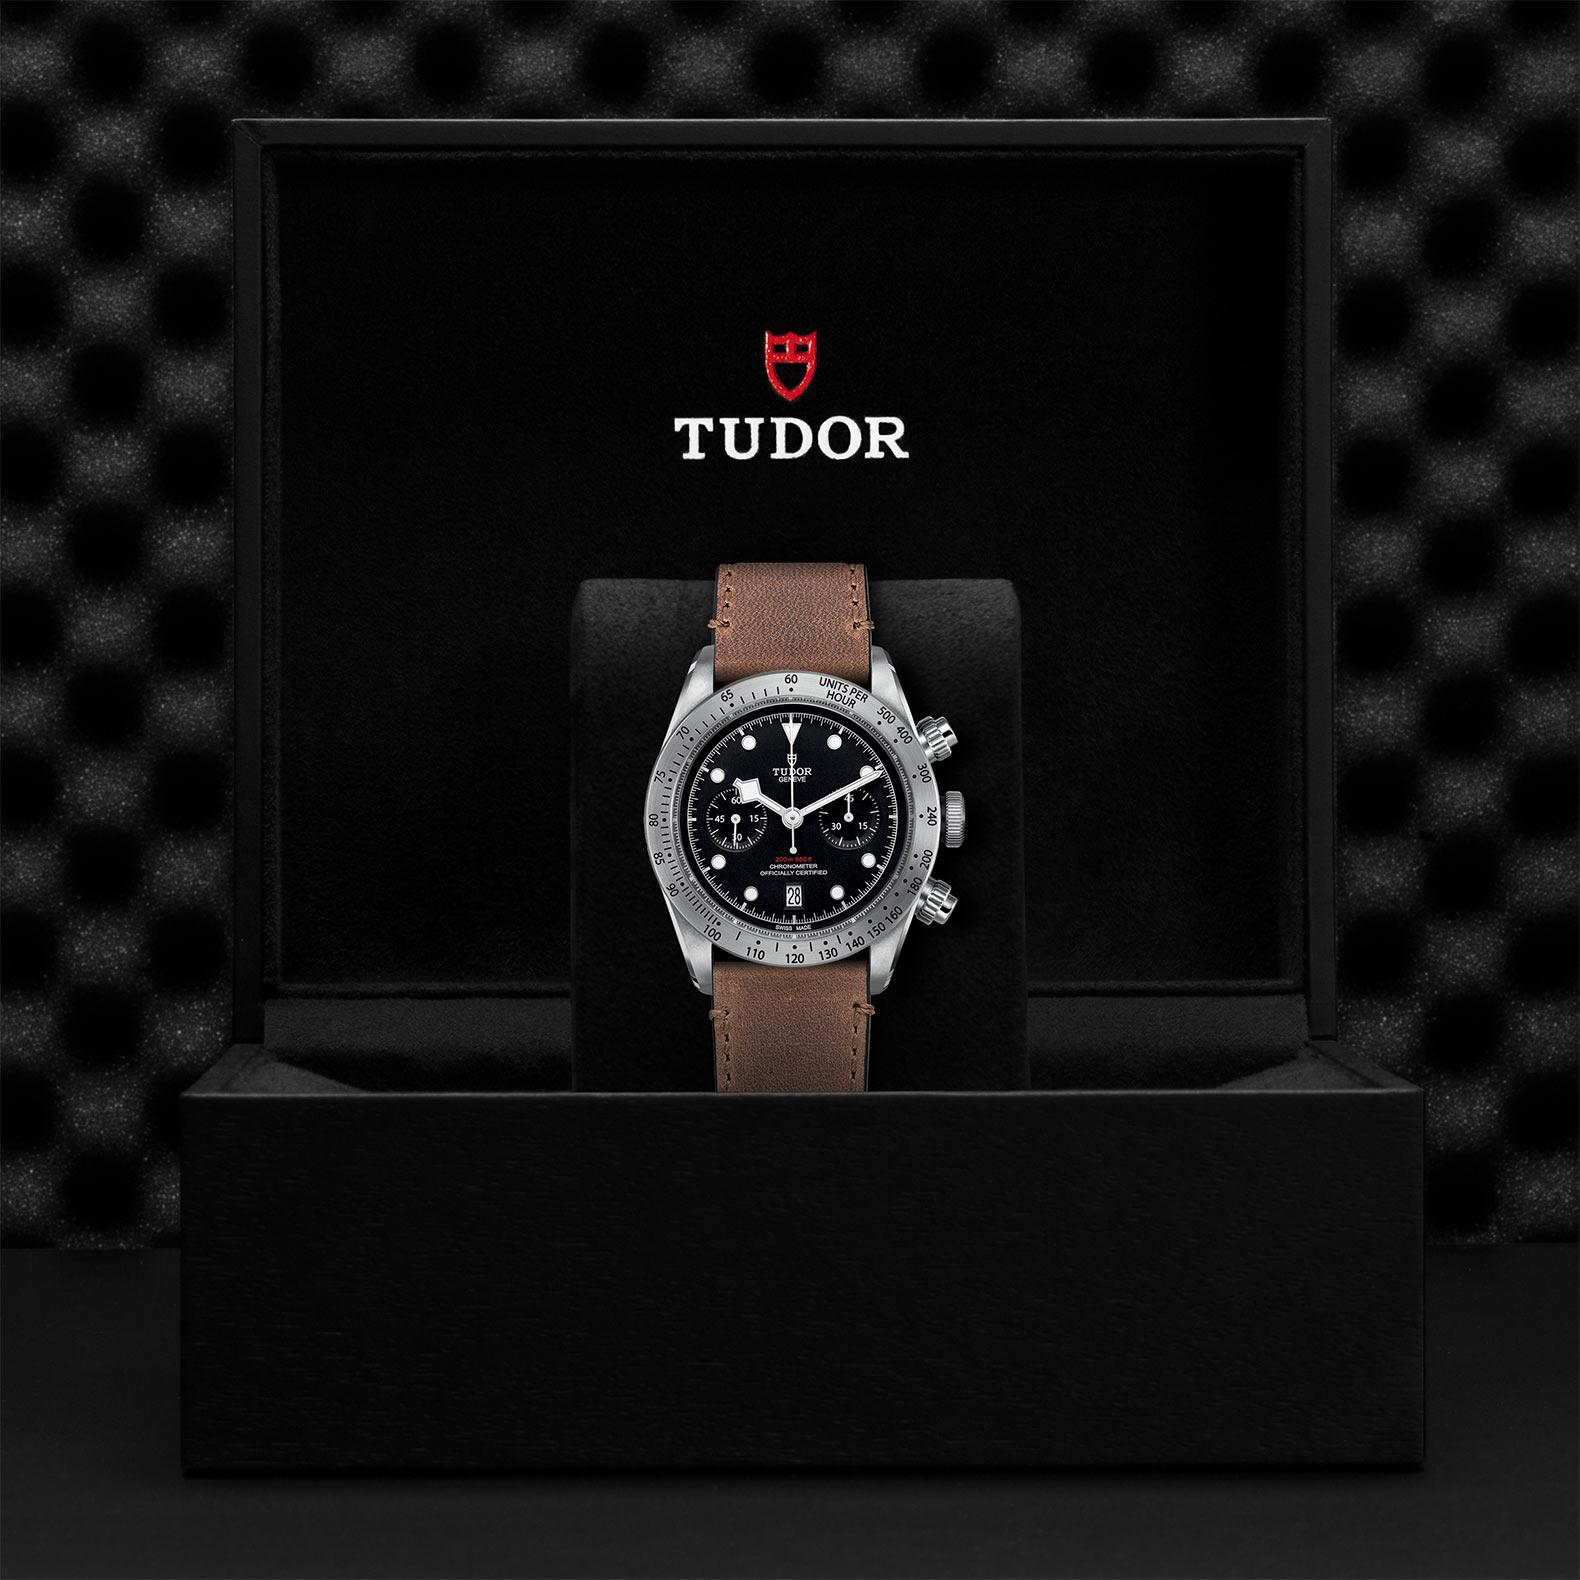 TUDOR Black Bay Chrono M79350 0005 Presentation